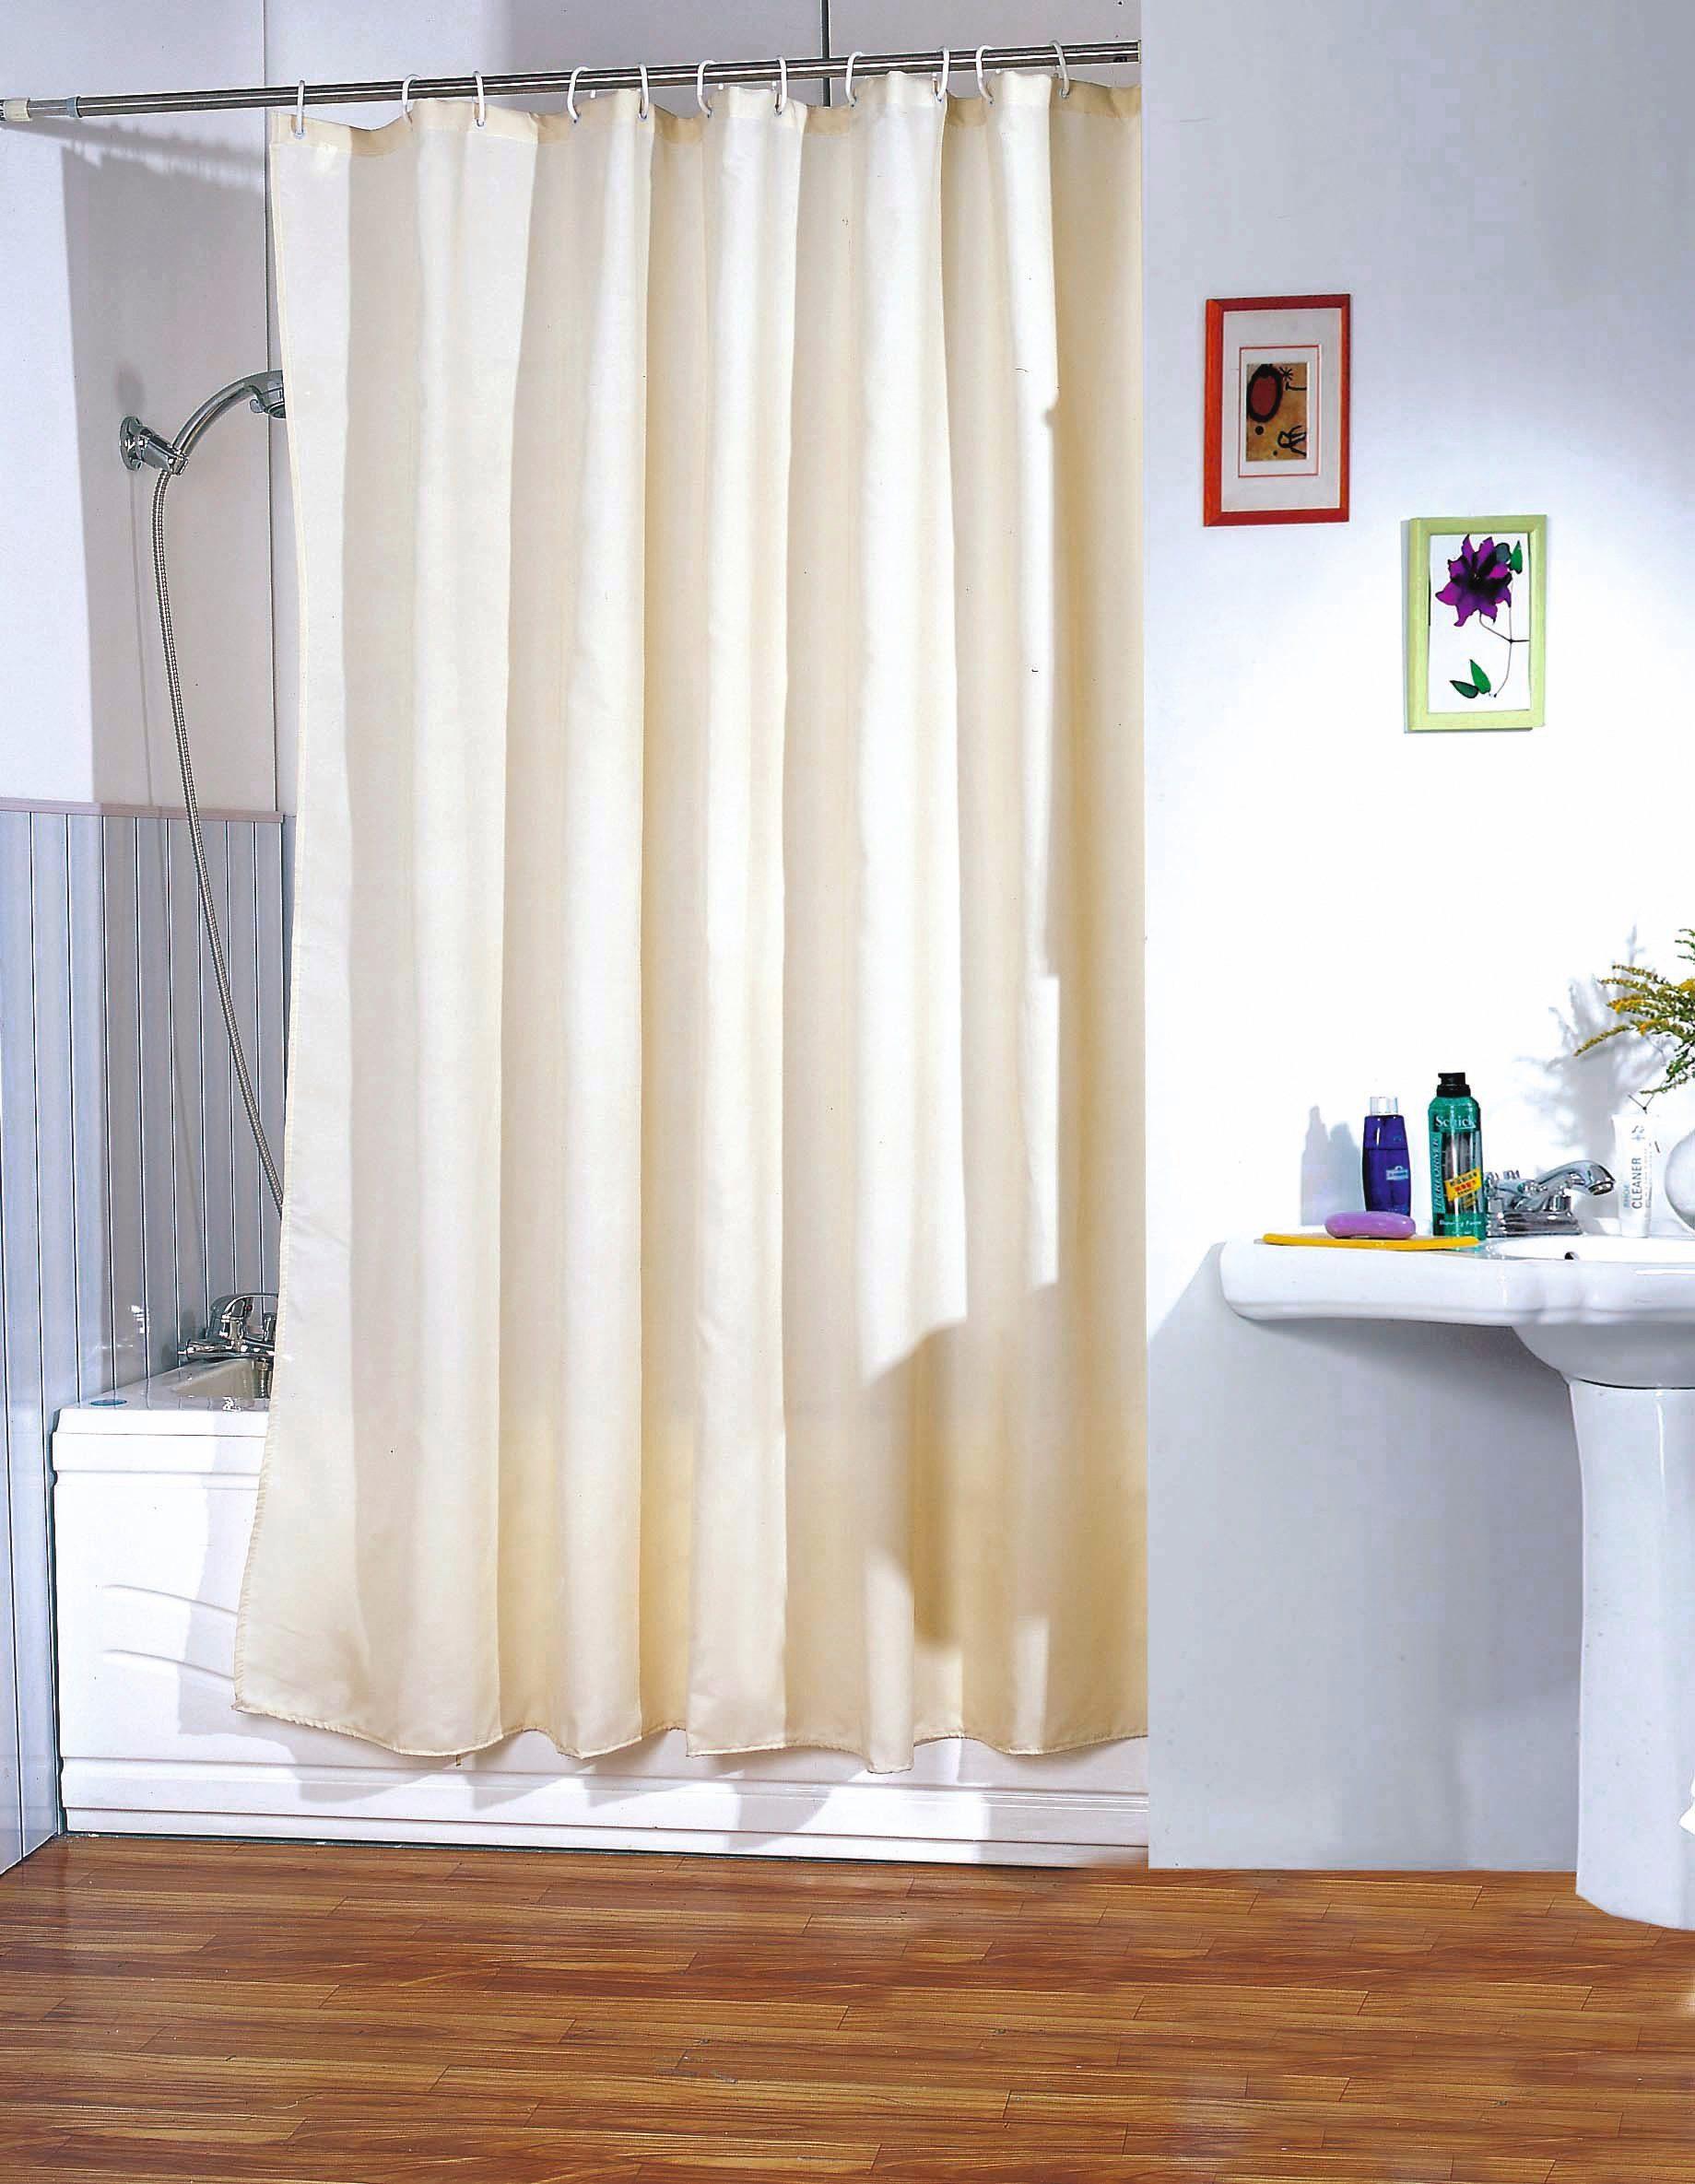 MSV Duschvorhang 180x200cm Anti Schimmel Textil Badewannenvorhang Wannenvorhang Beige